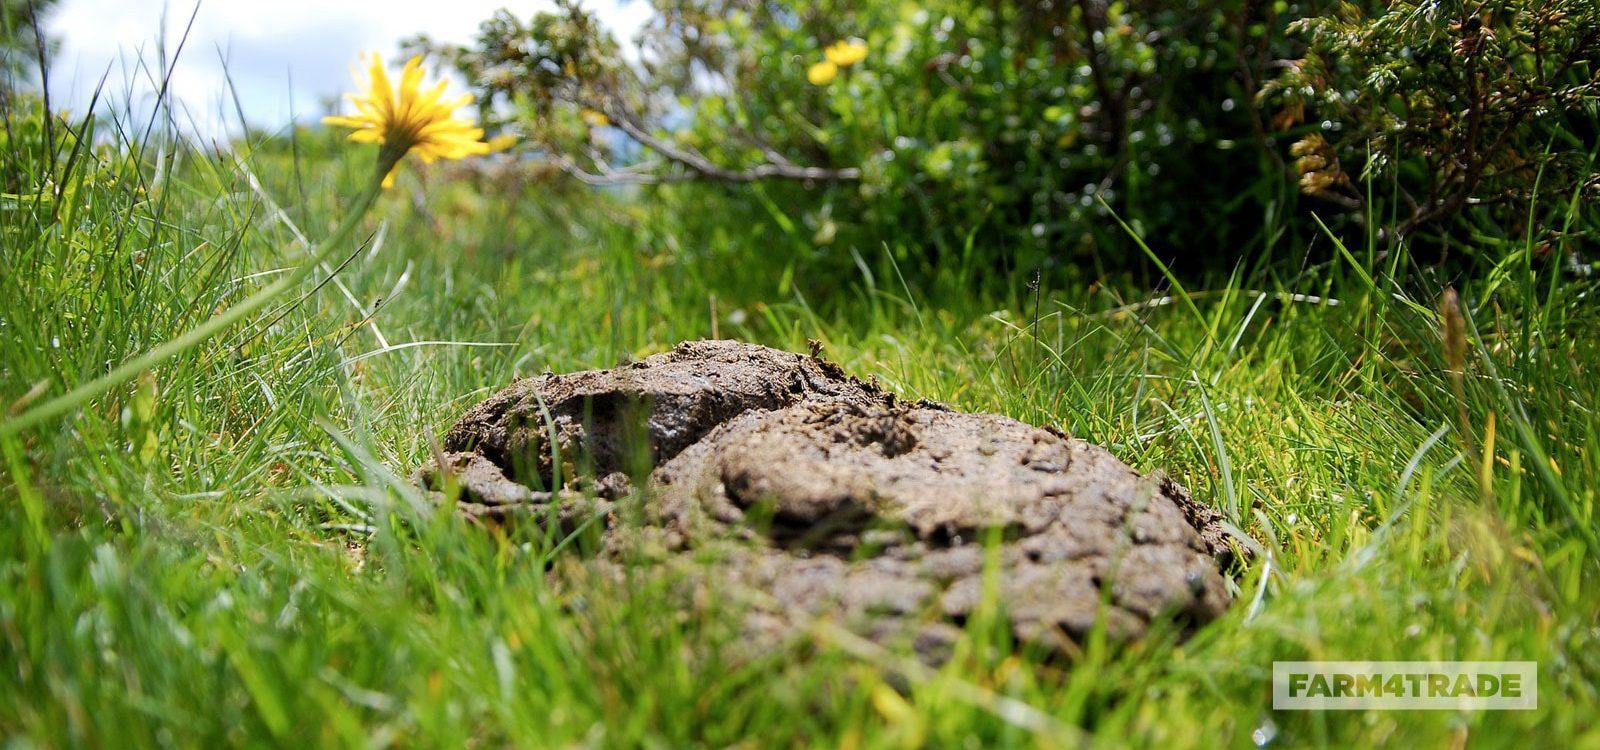 Farm4Trade-dung-analysis-determine-quality-of-forage